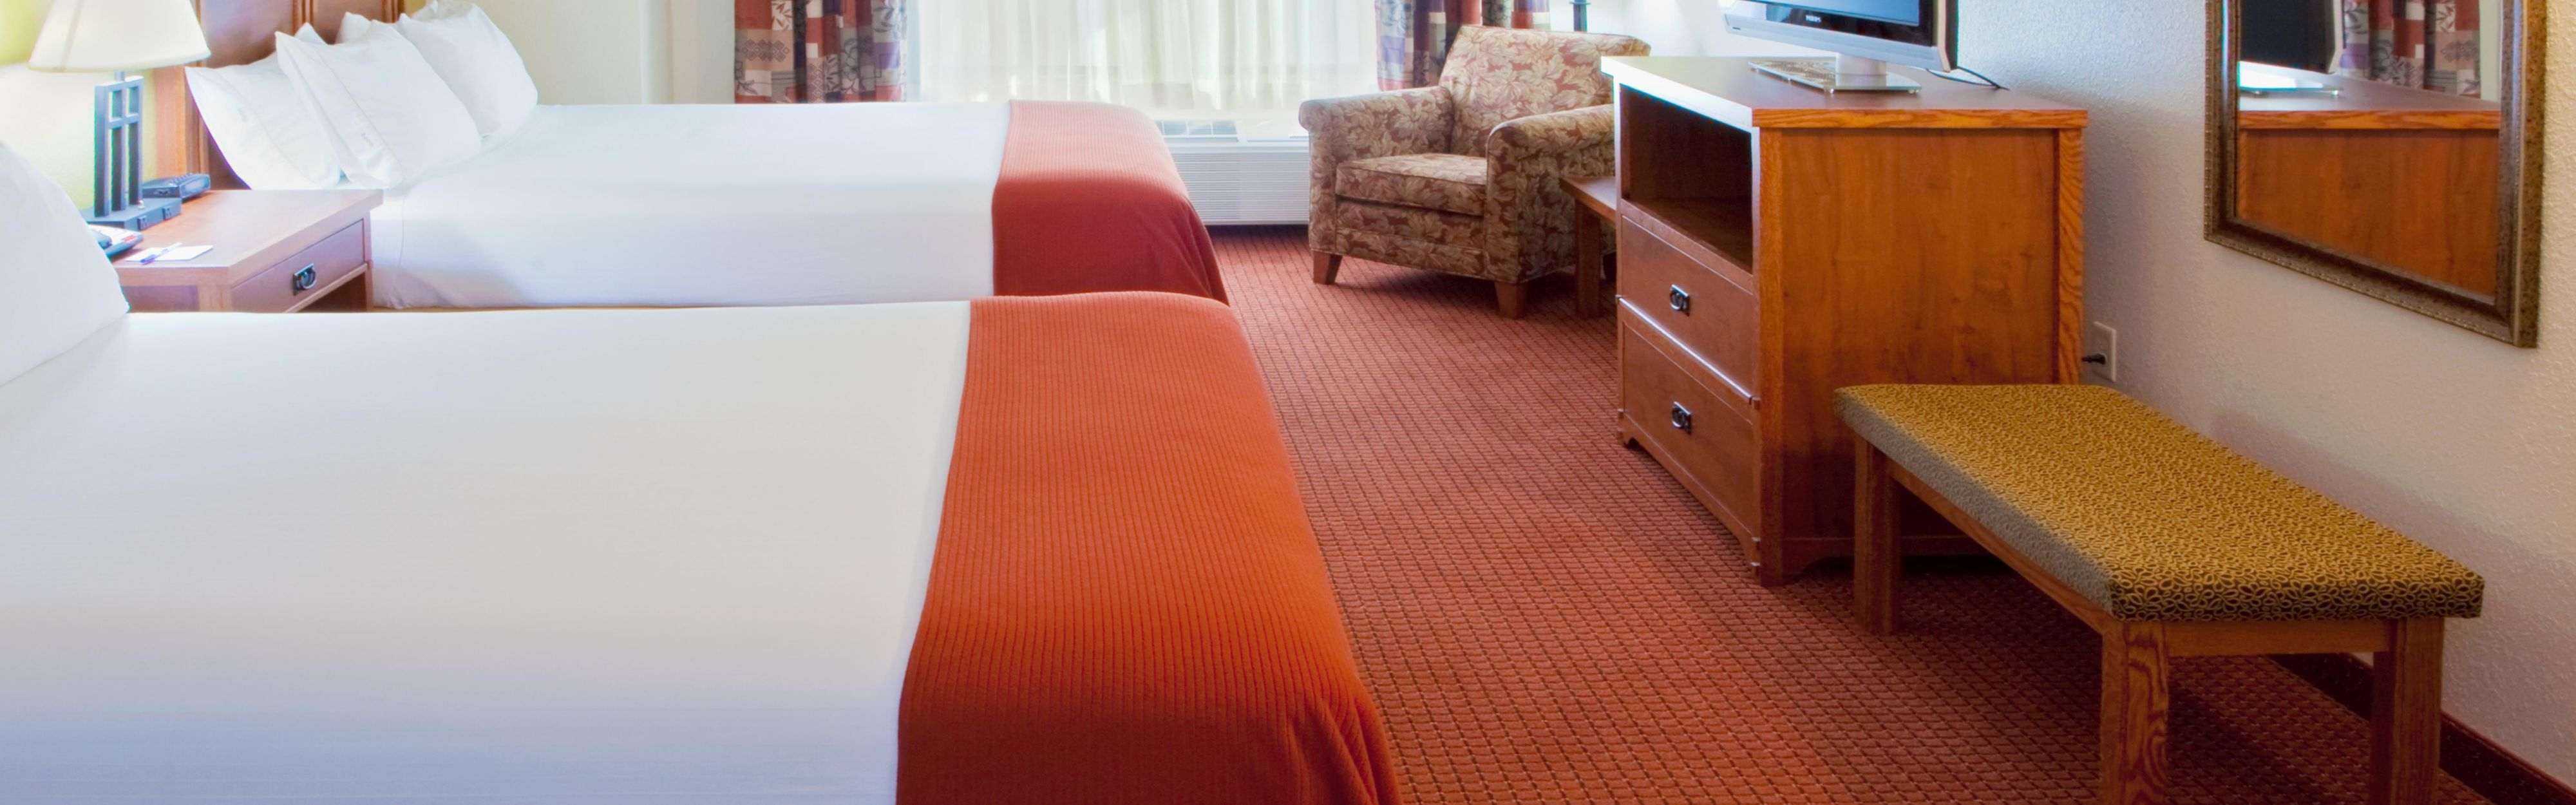 Holiday Inn Express & Suites Weston image 1